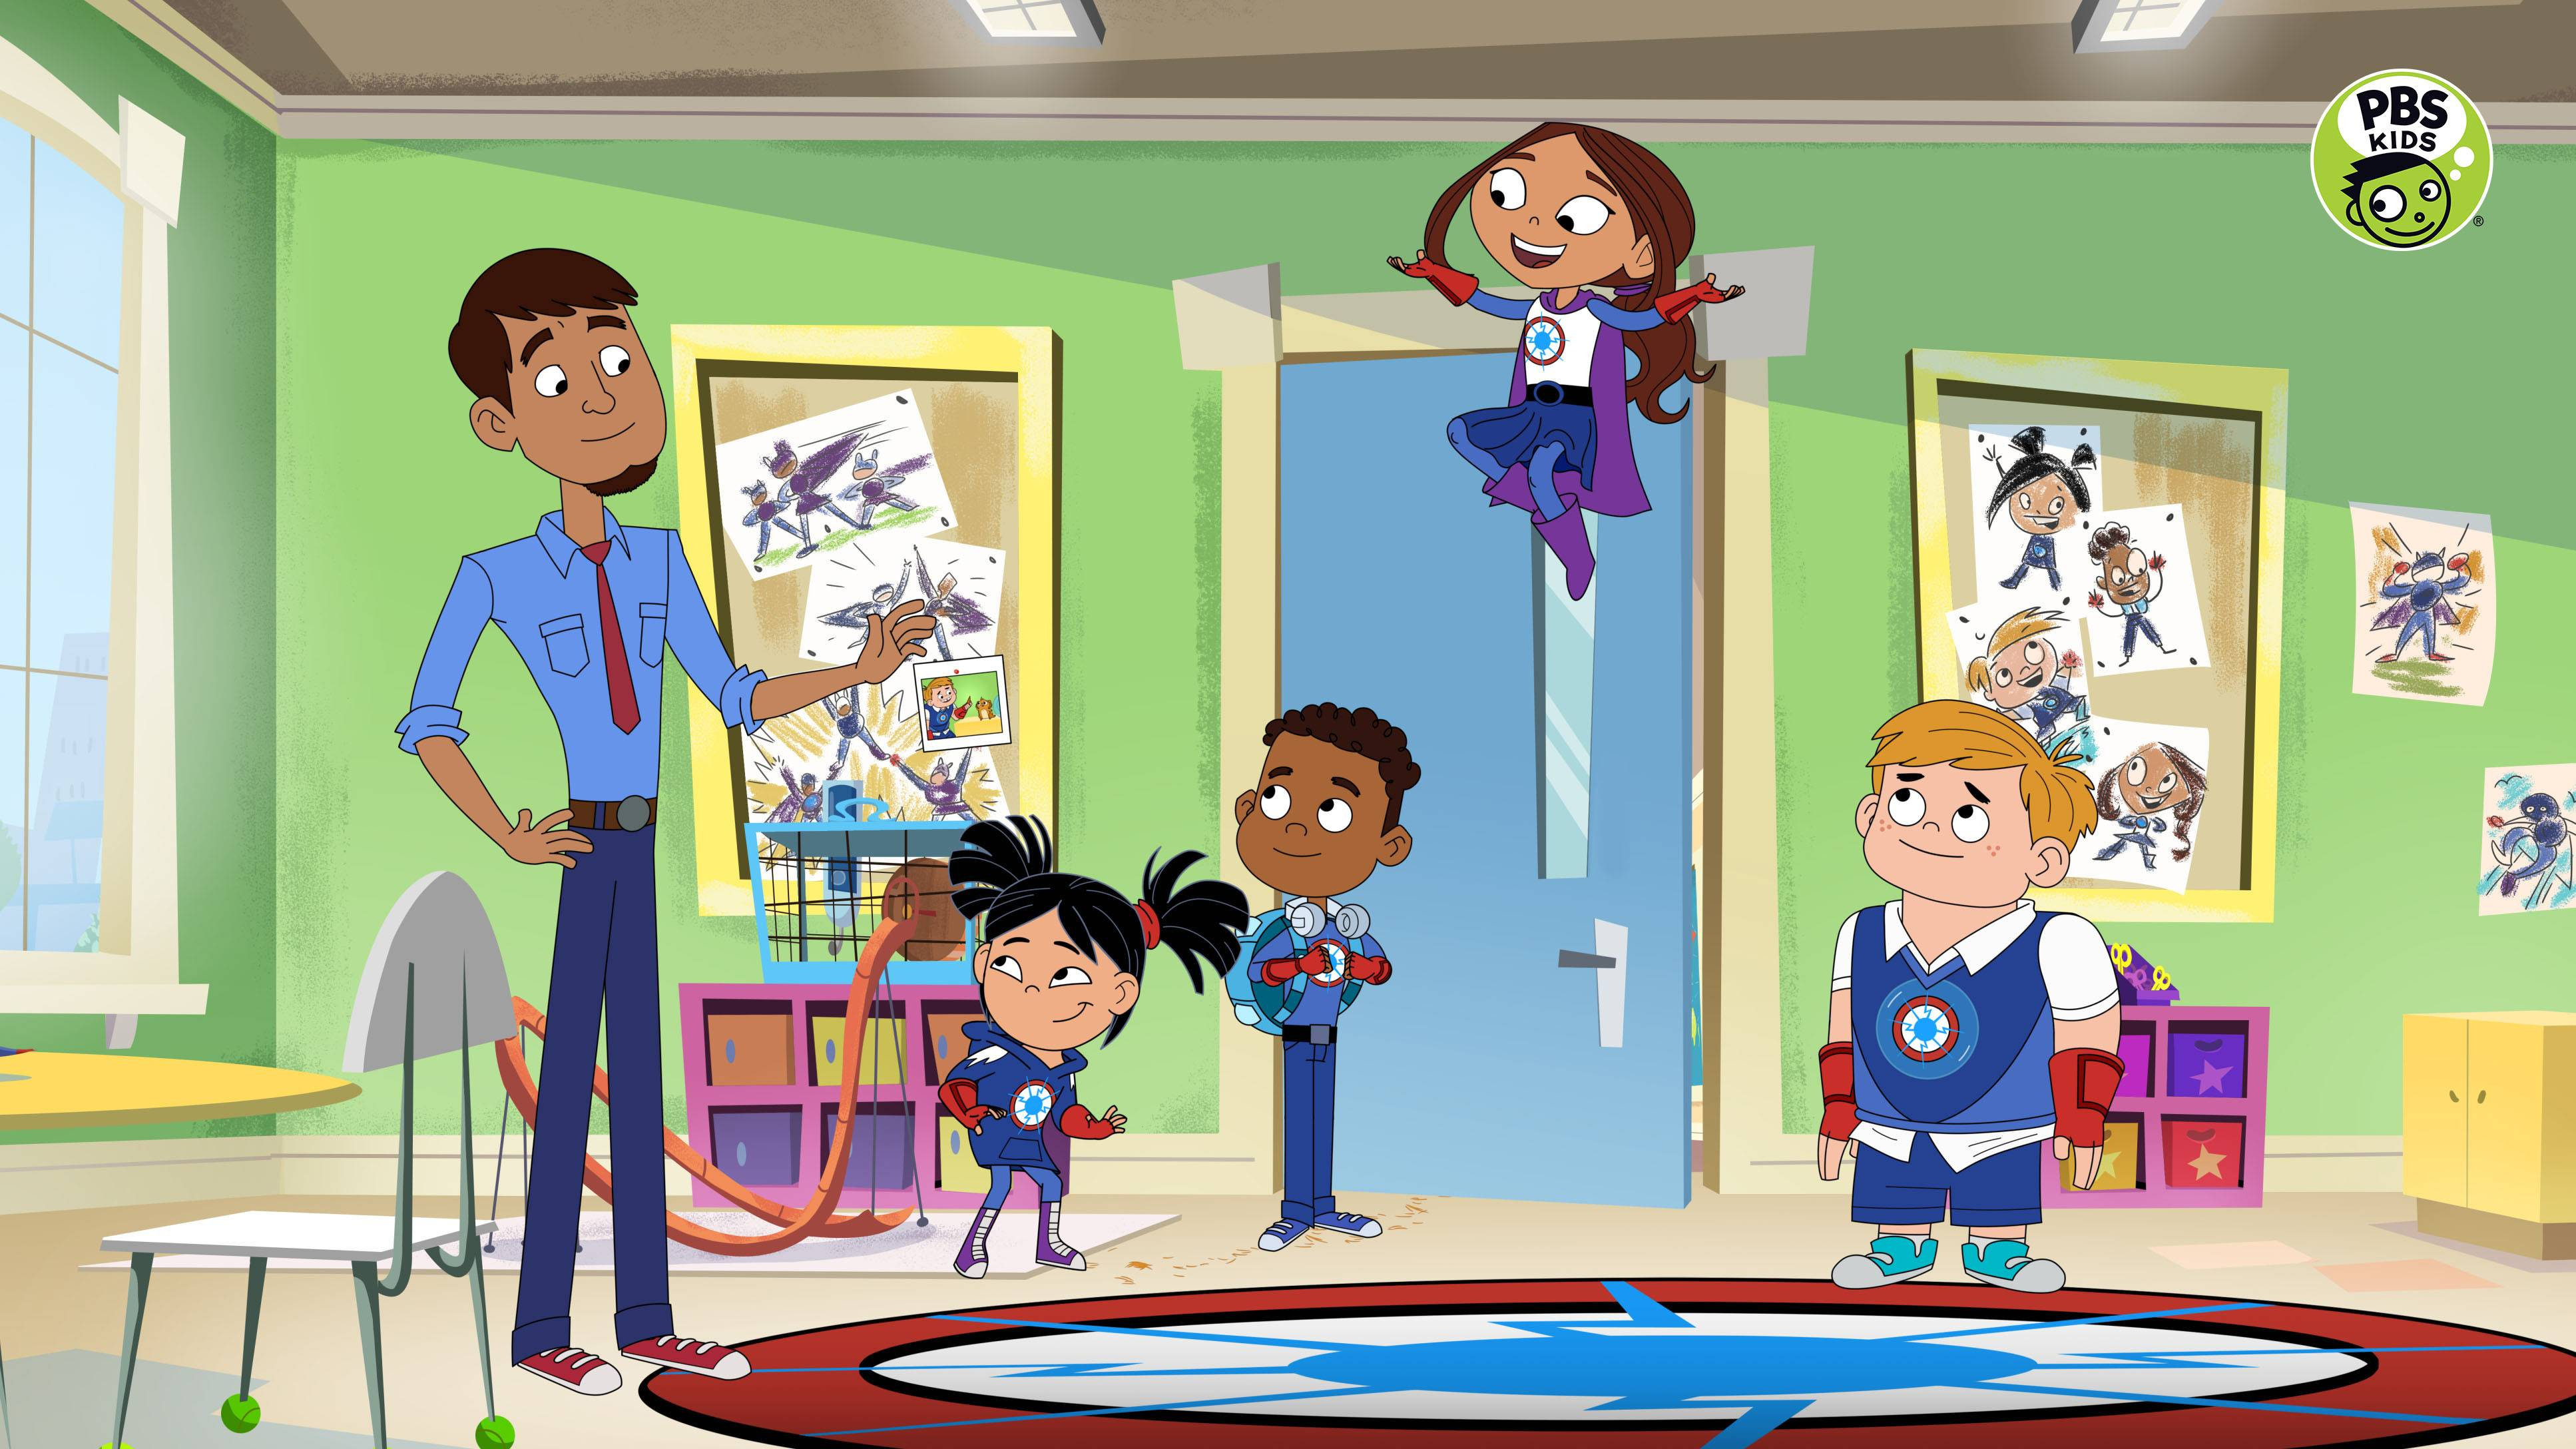 Pbs Kids Announces New Series Hero Elementary Premiering Summer 2020